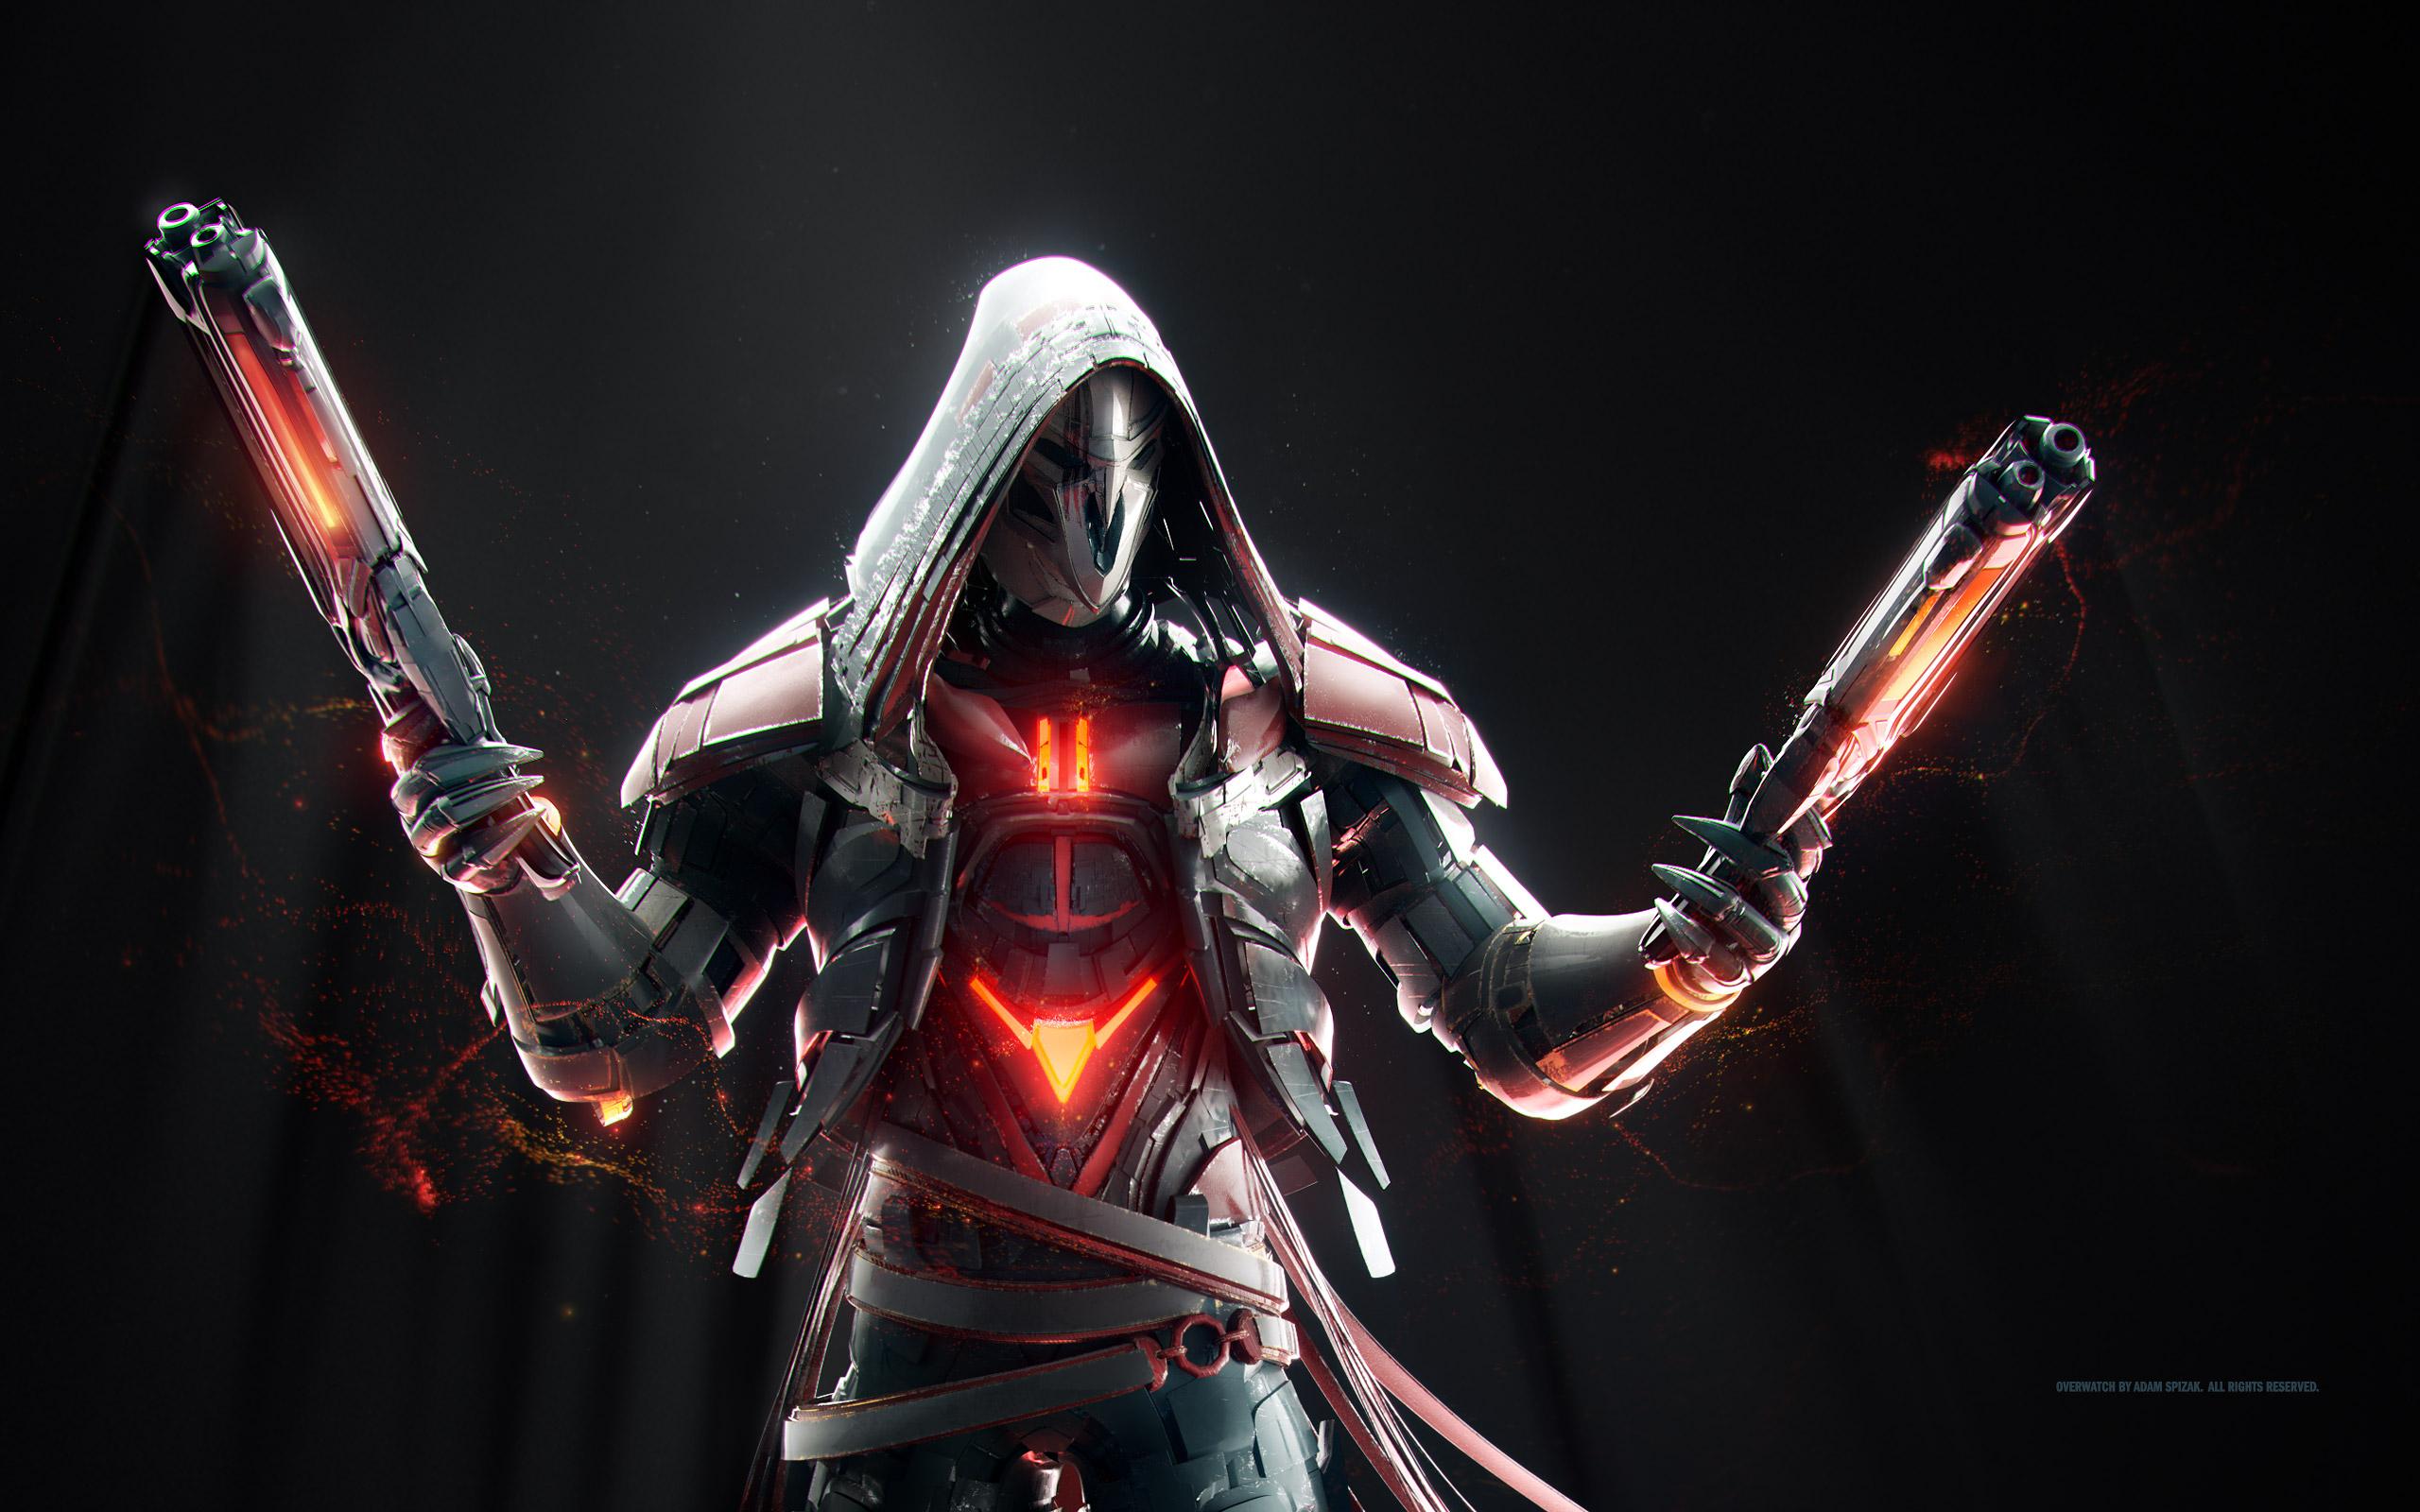 Reaper Overwatch Artwork Hd Hd Games 4k Wallpapers Images